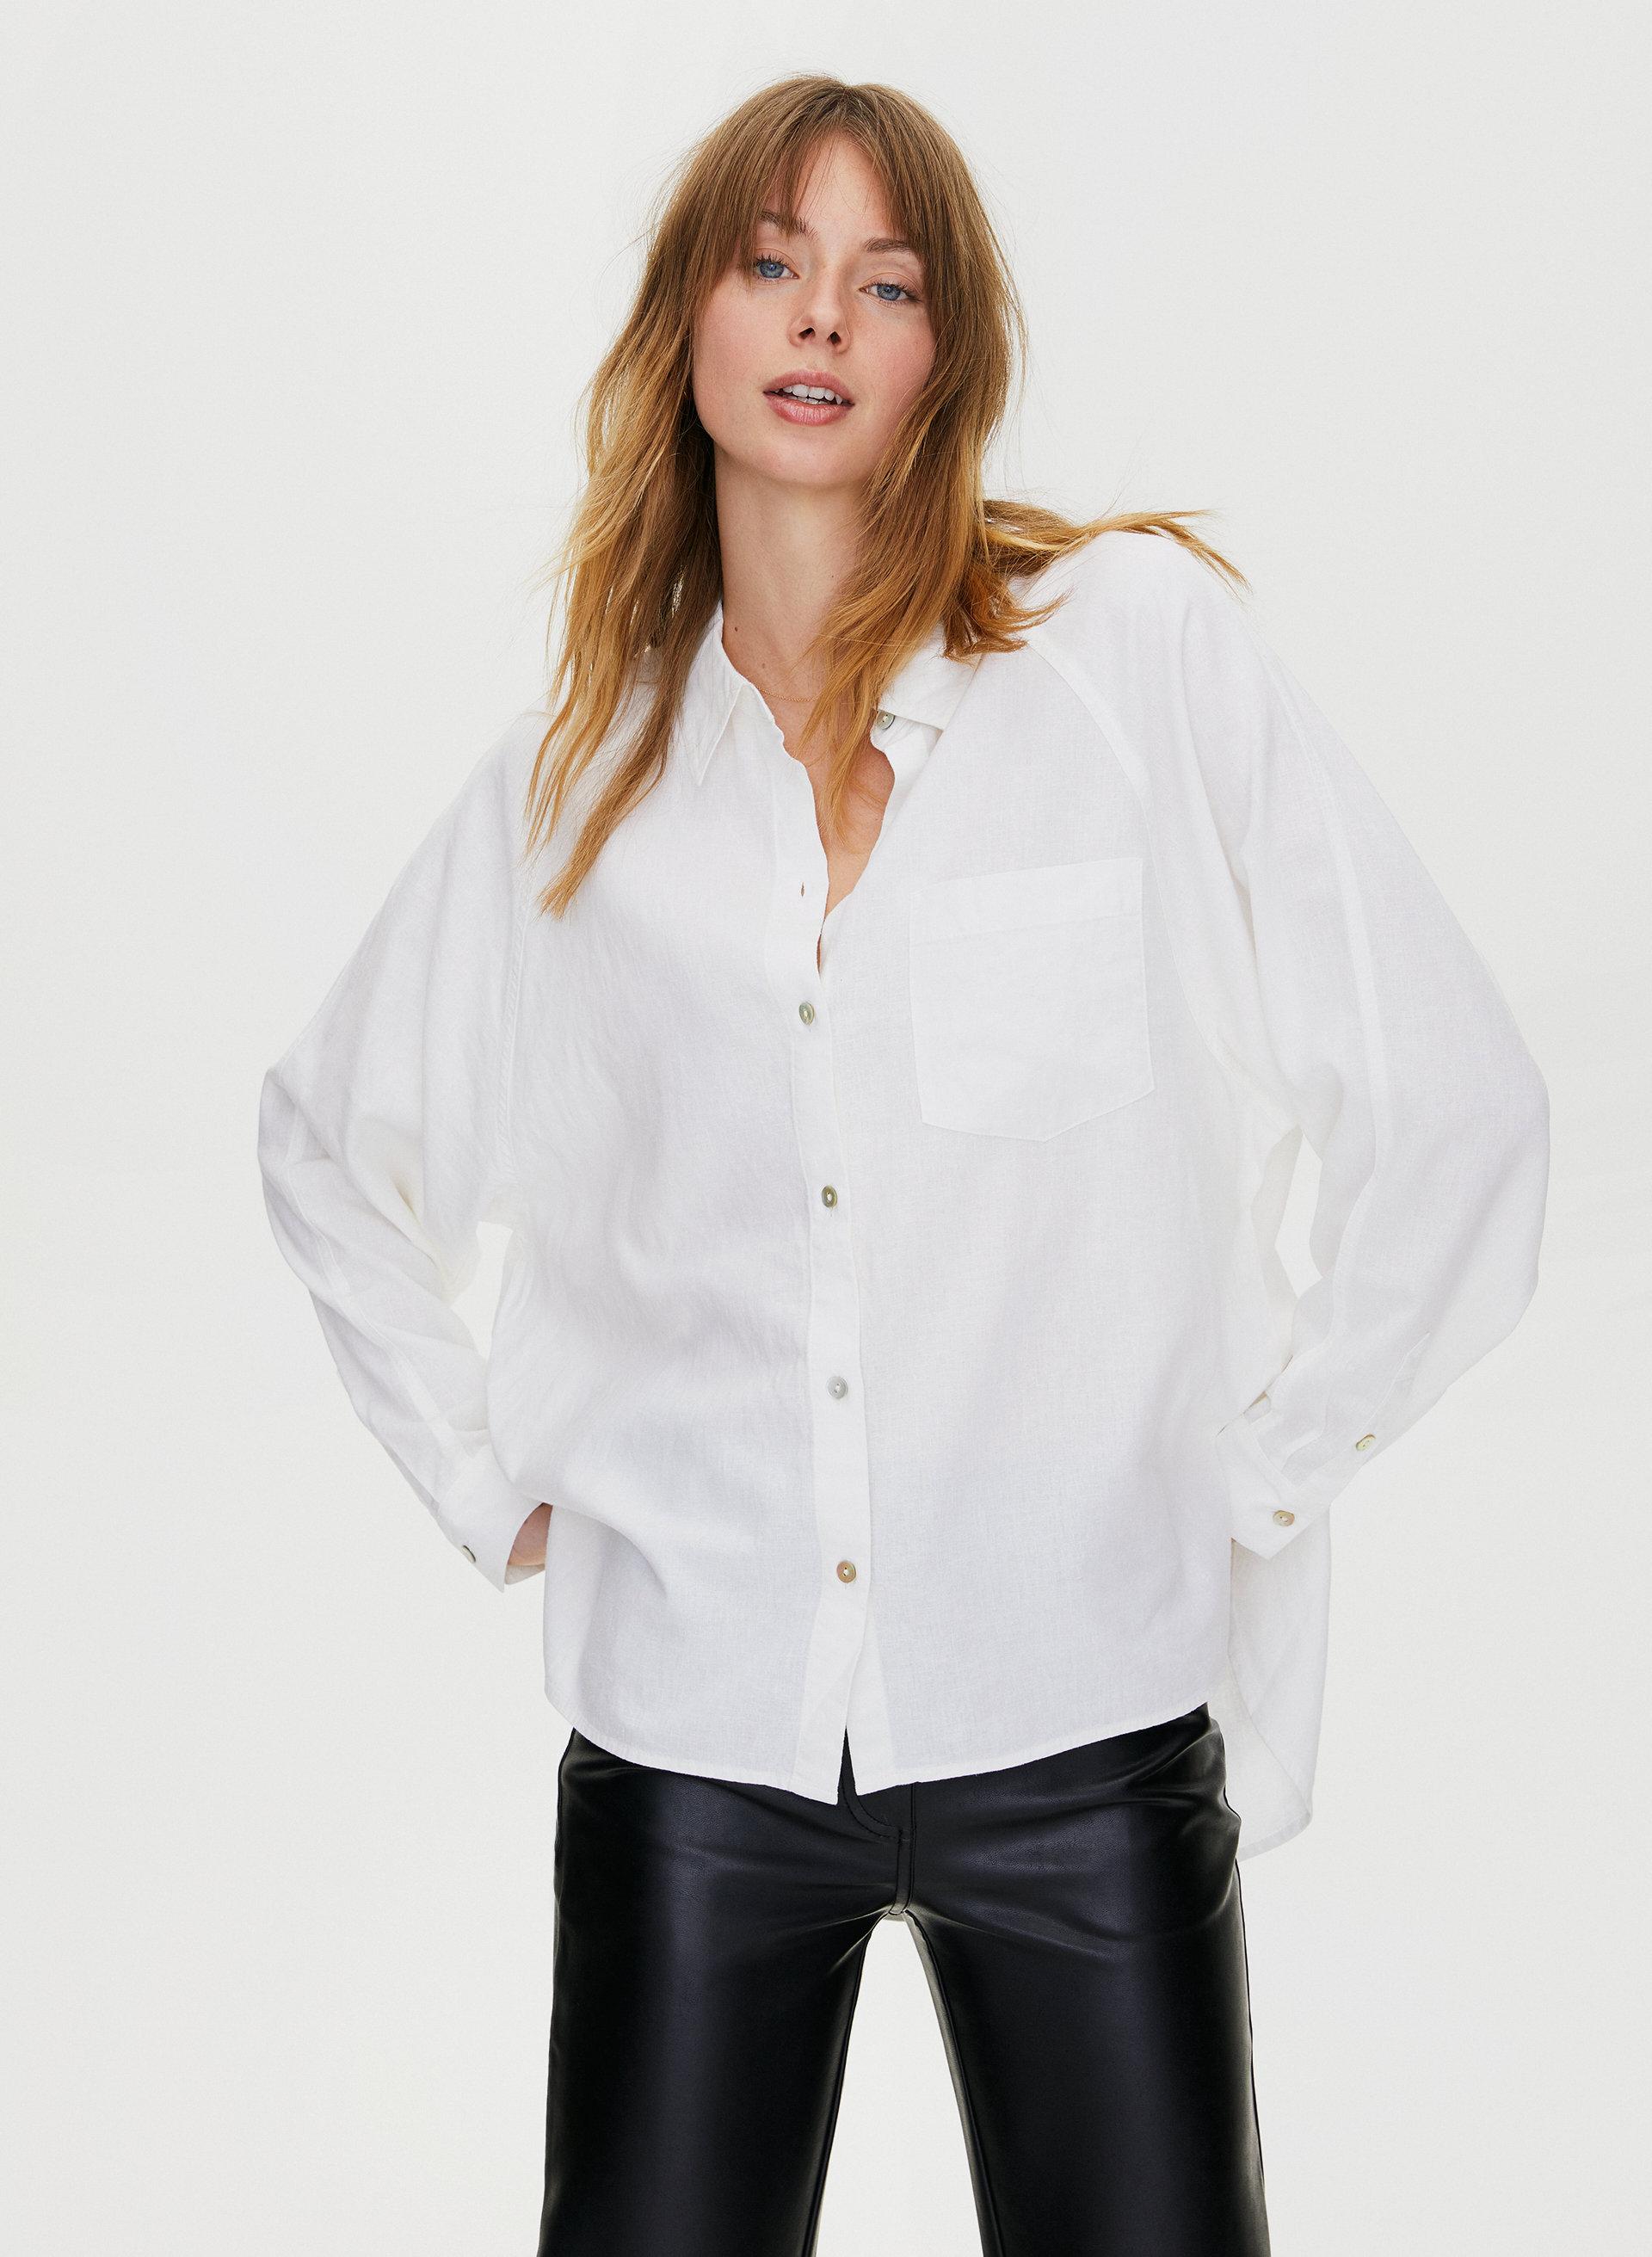 Casual Blouse Clothes L6Nv4o@A Girls Short Sleeve Hope You Like Pitbulls Shirts XS-XL